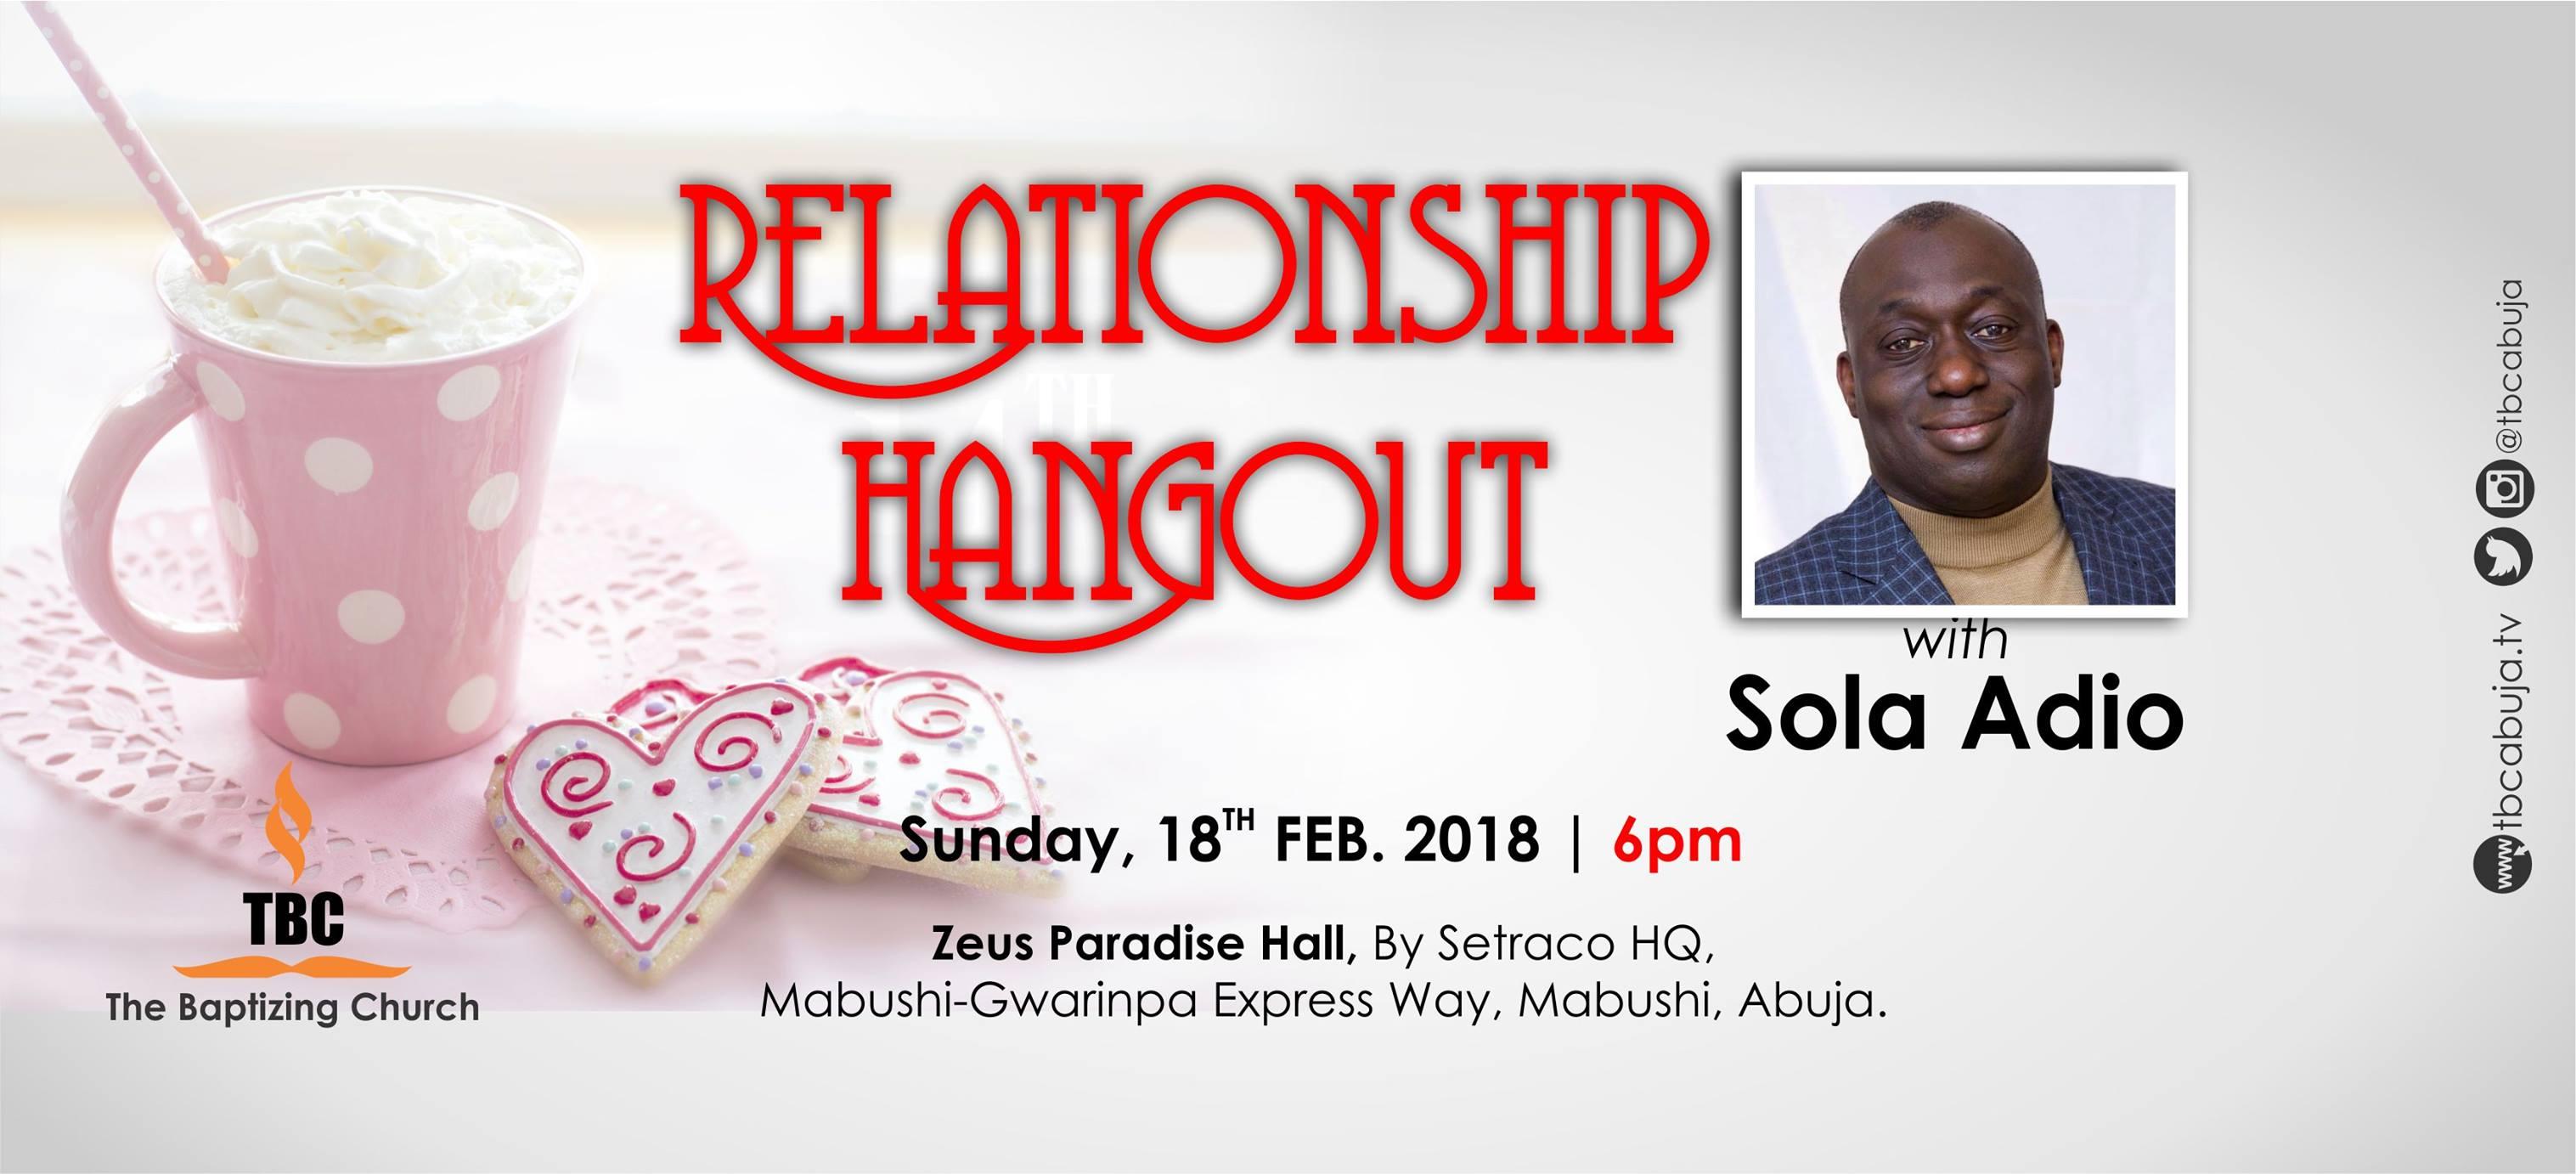 Relationship Hangout With Sola Adio - The Baptizing Church, Abuja